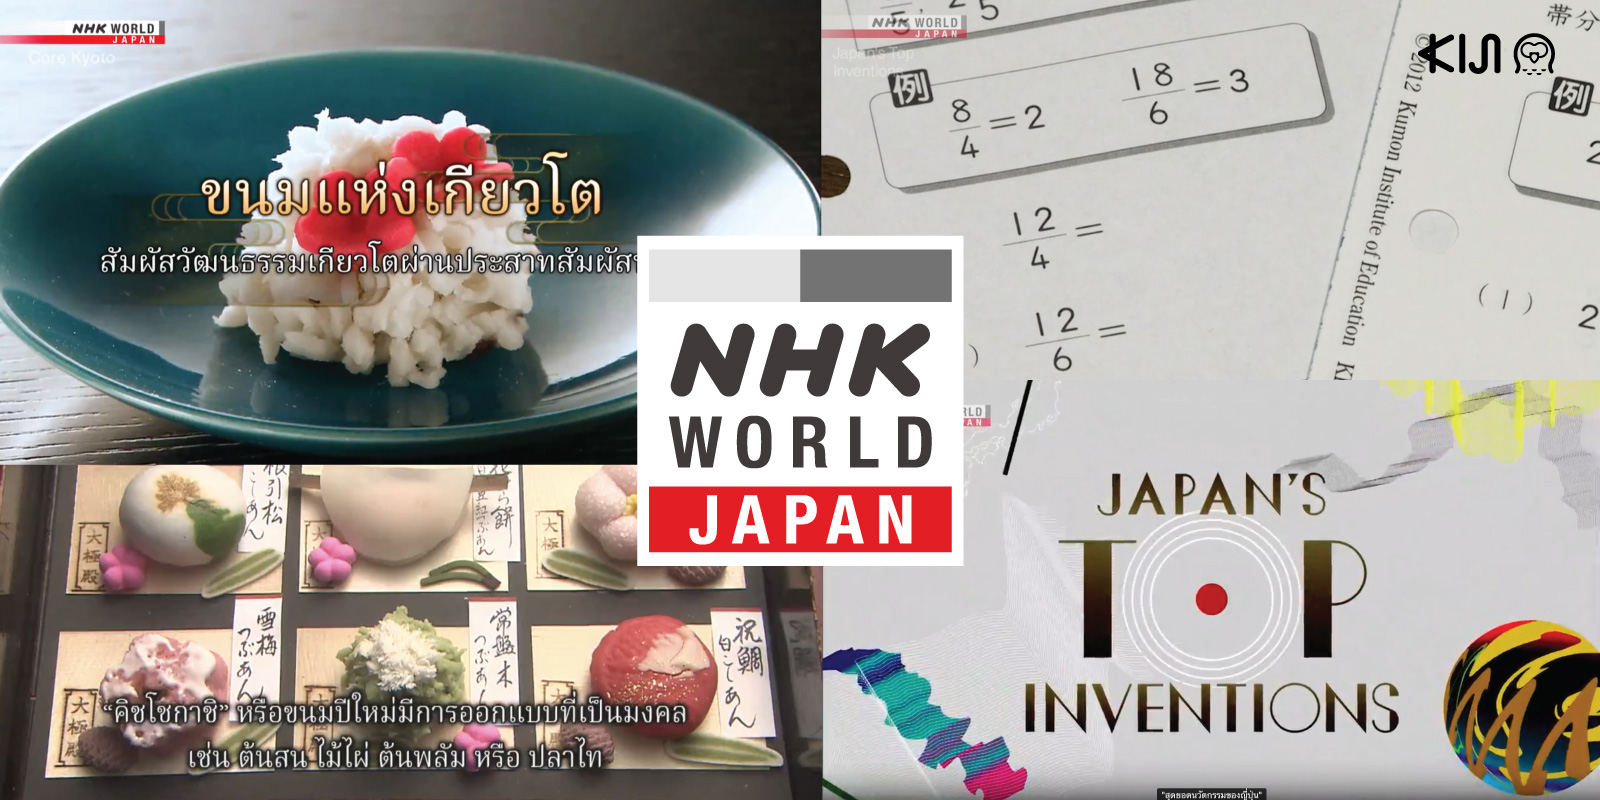 NHK WORLD-JAPAN :สื่อวิดีโอนำเสนอทุกเรื่องน่ารู้ของญี่ปุ่น